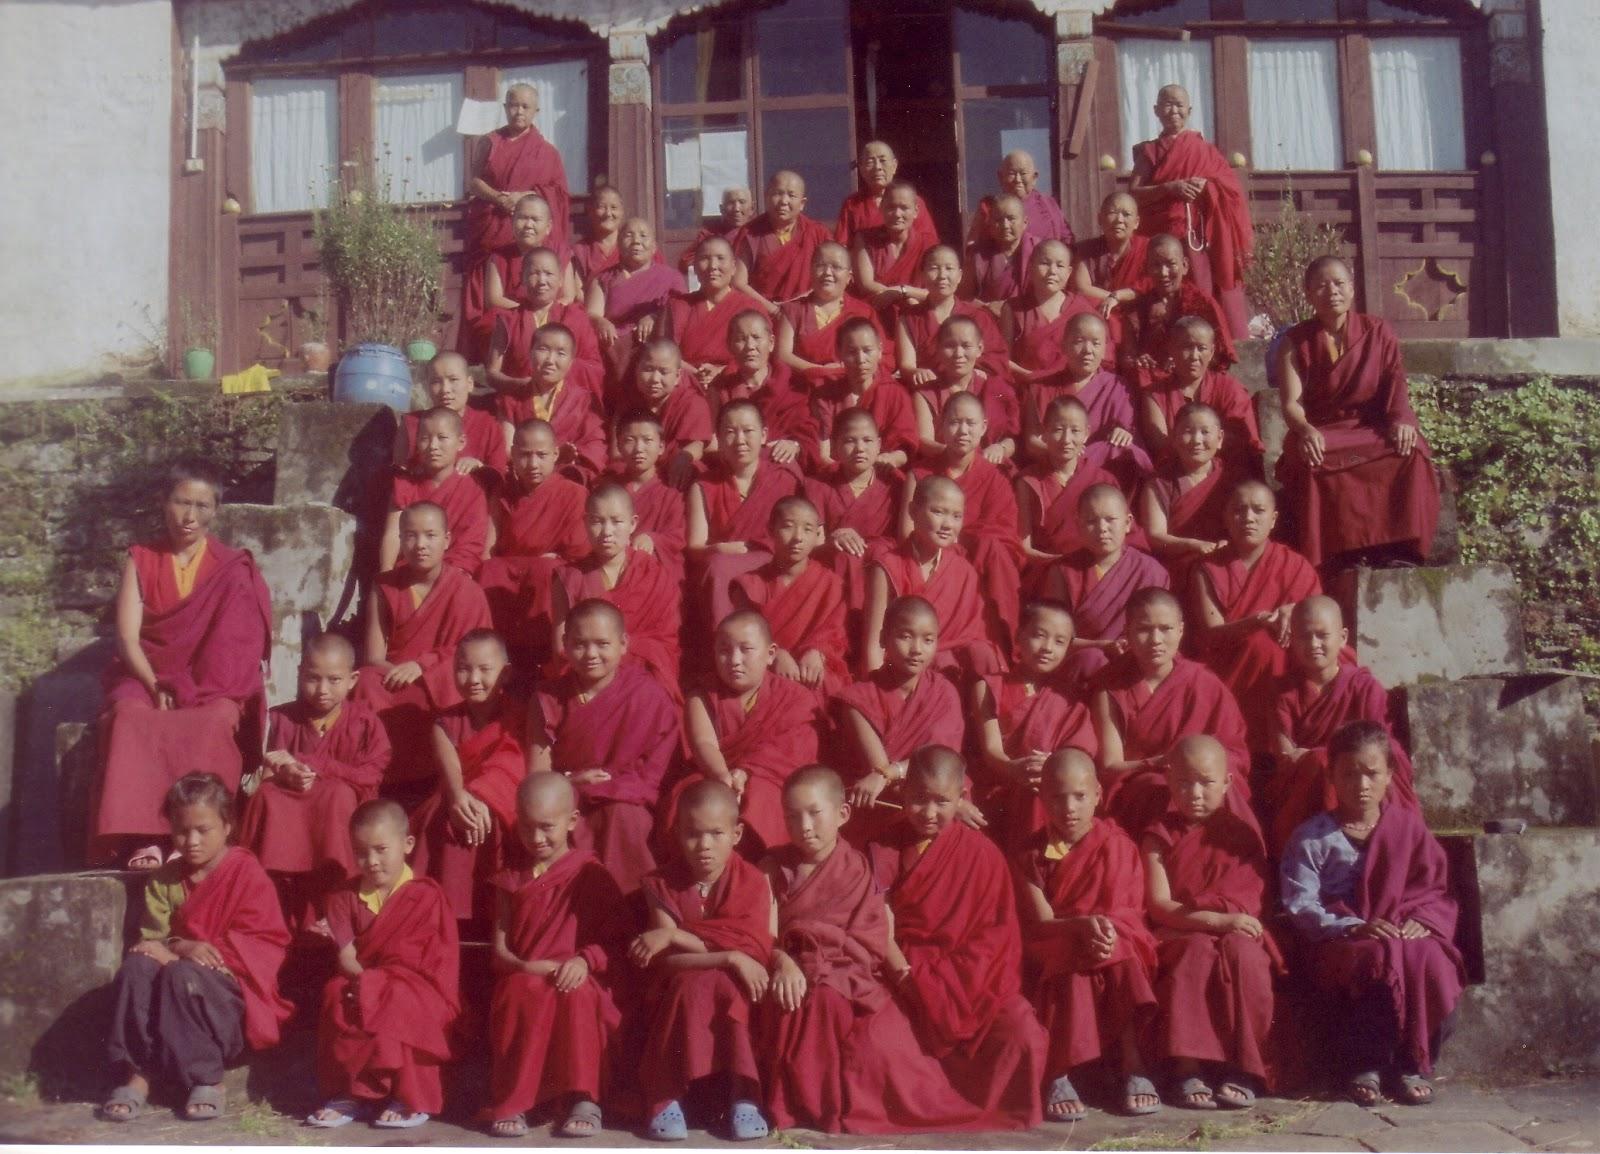 Bigu Nunnery - every year Rinpoche sponors them in 100 million mani retreats